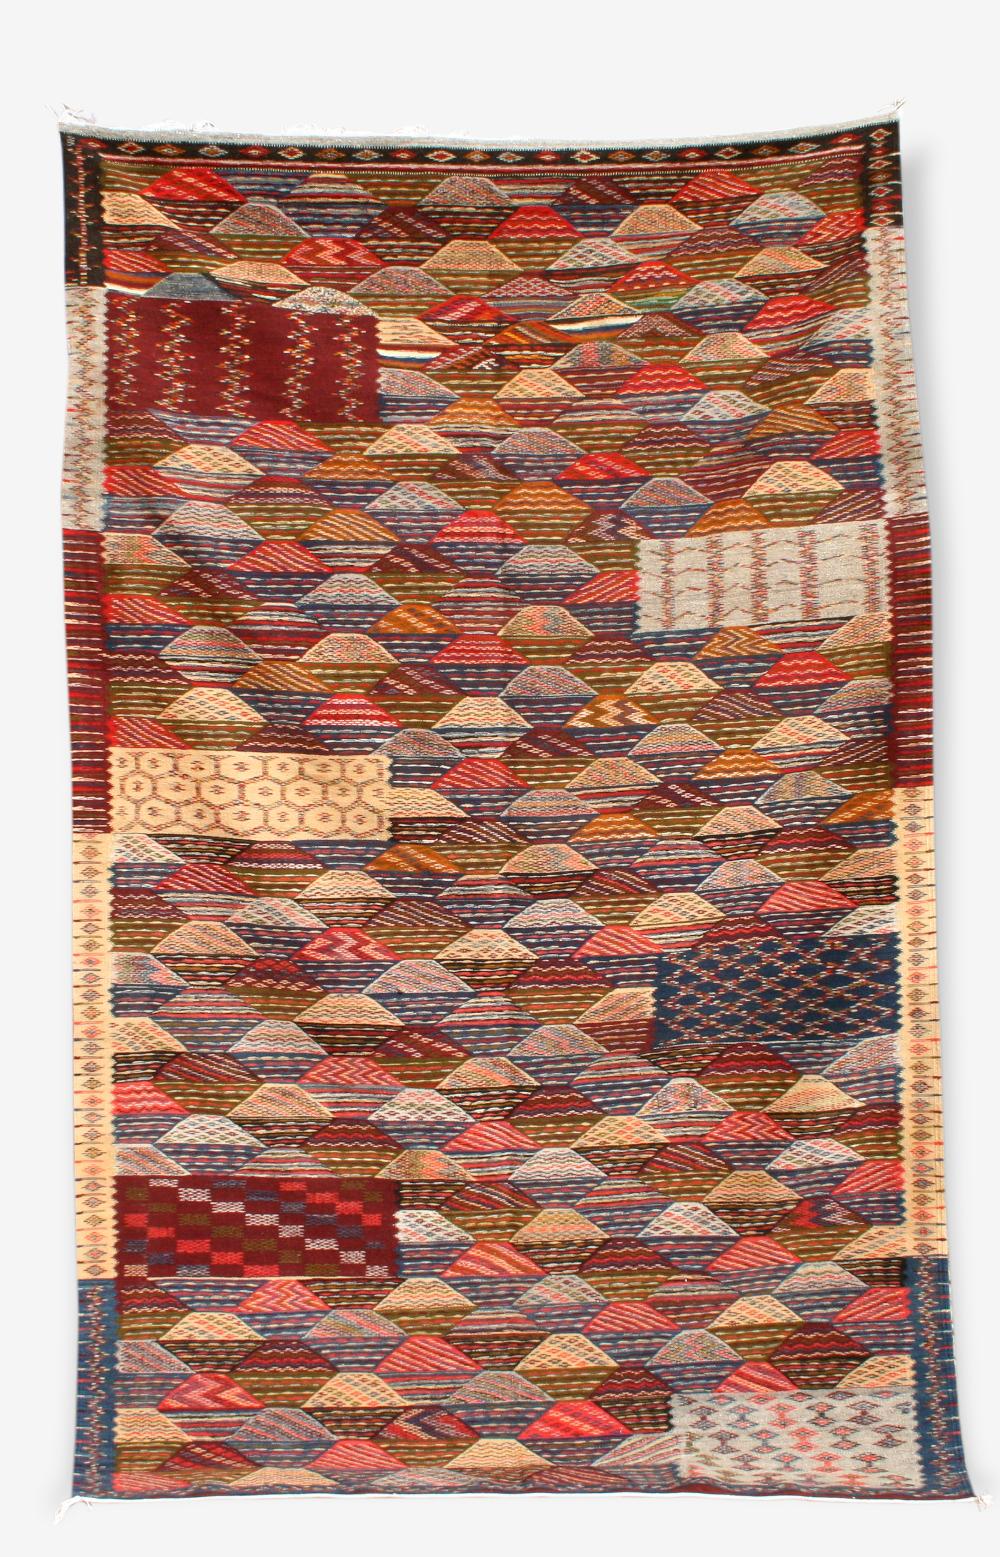 Tapis Kilim Berbere Tapis Kilim Marocain Kilim Berbere Kilim